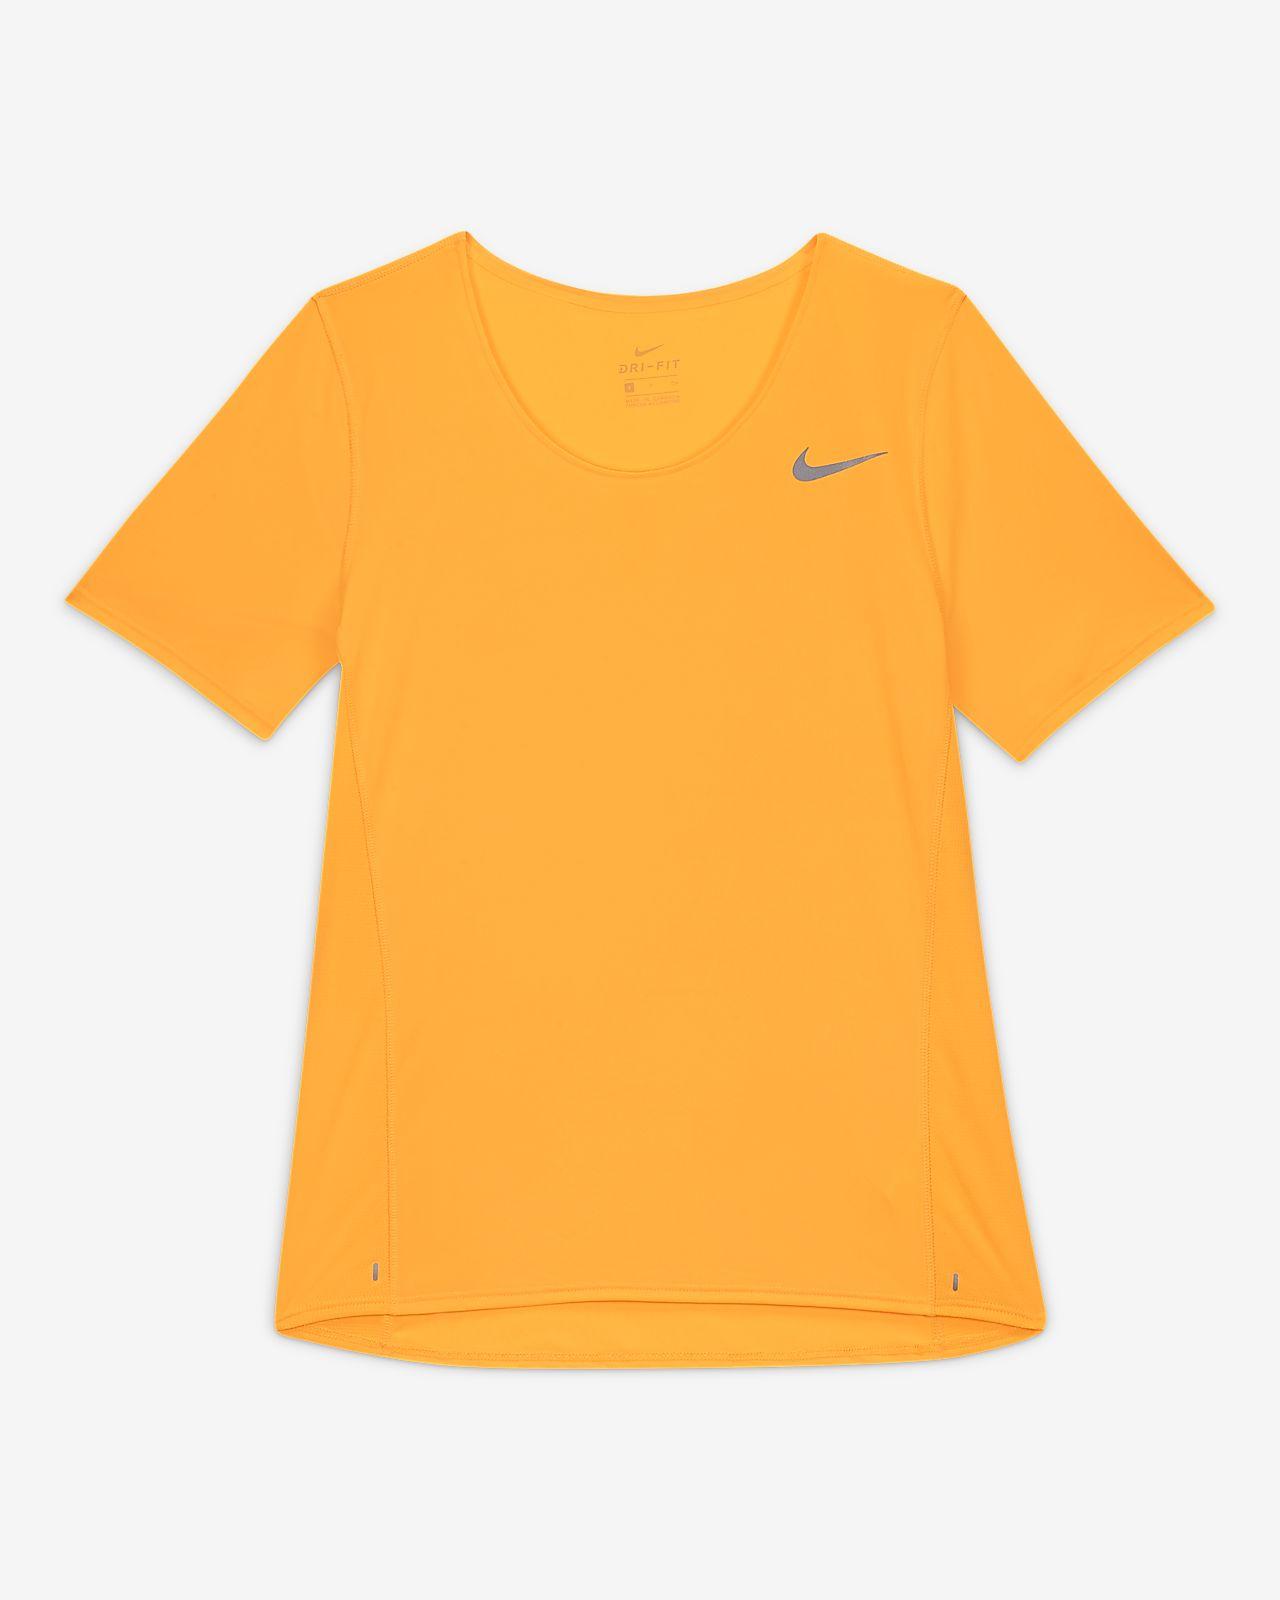 Nike City Sleek Hardlooptop met korte mouwen voor dames